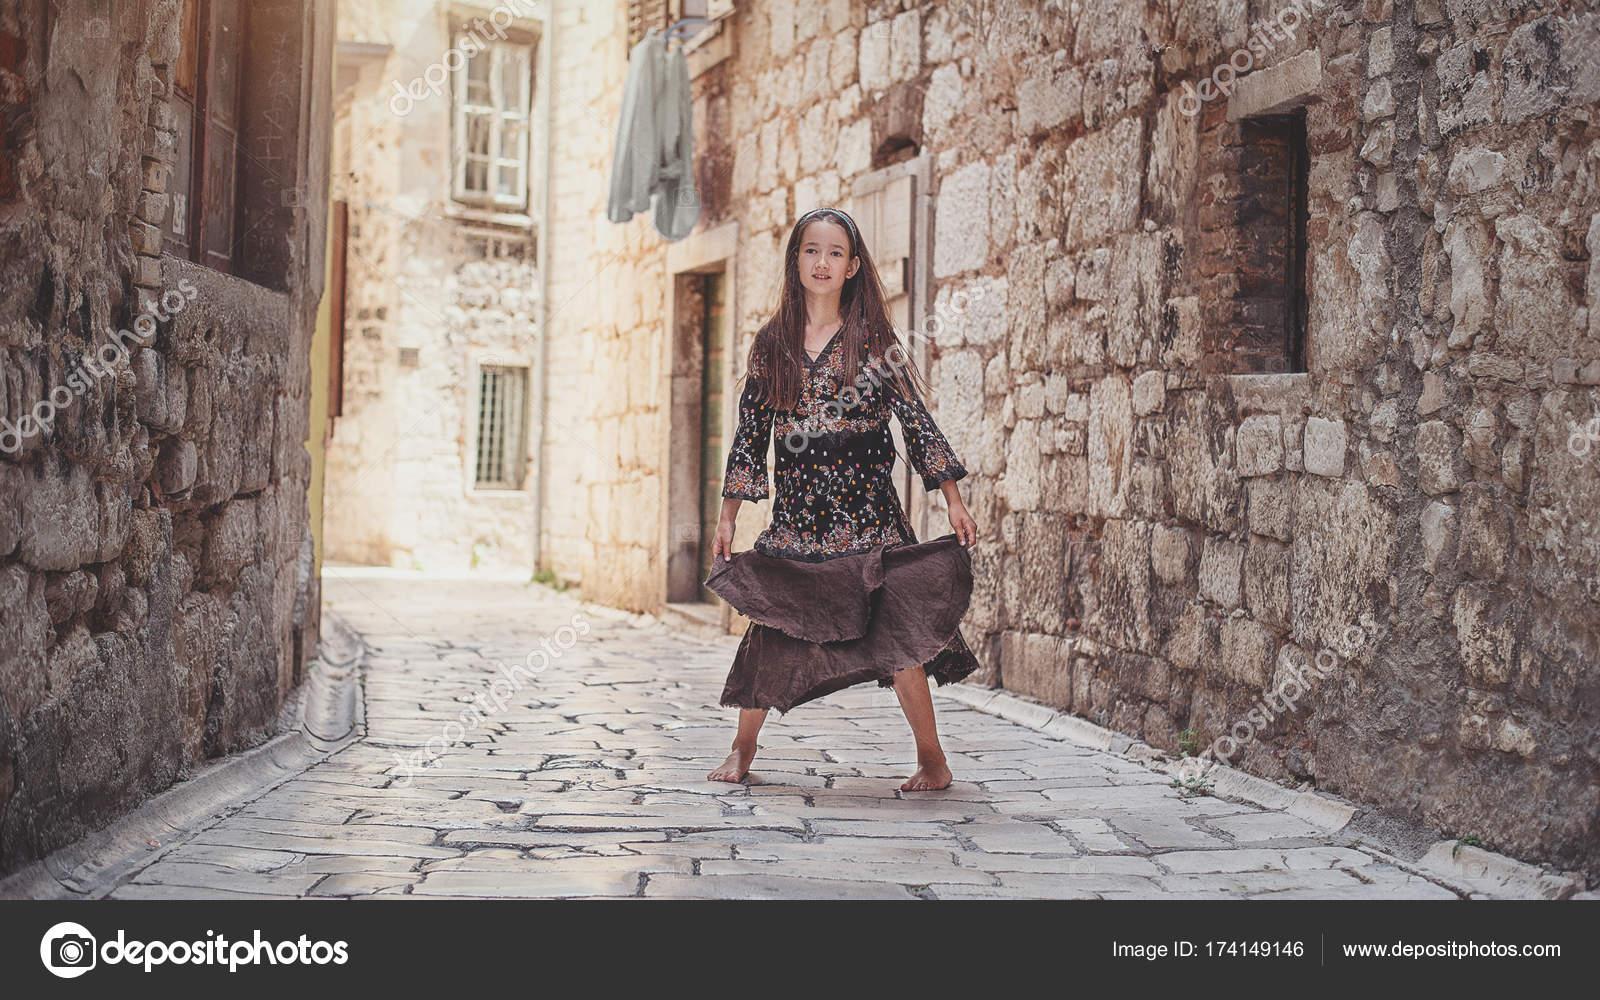 b746687e9a7 Χαριτωμένο νεαρή κοπέλα περπάτημα στην παλιά πόλη. Ωραίο θηλυκό παιδί στην  μεσαιωνική πόλη — Φωτογραφία